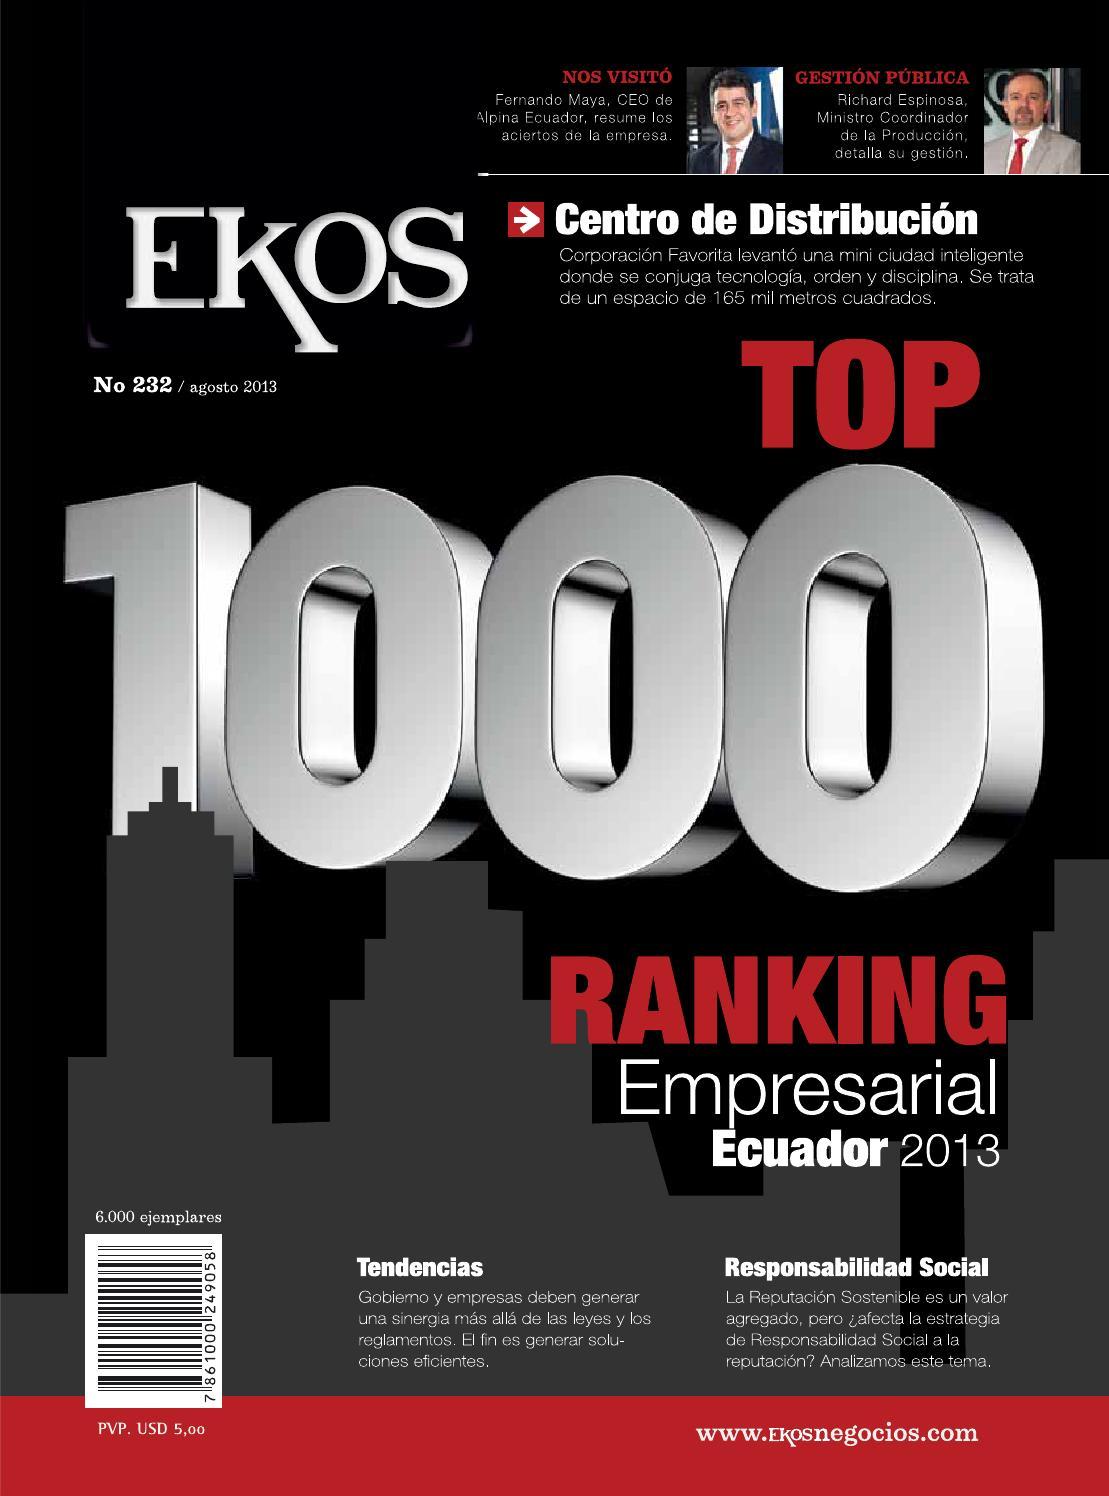 5068a6dad0ed Revisa Ekos - Ranking Empresarial Ecuador 2013 by Ekos - issuu